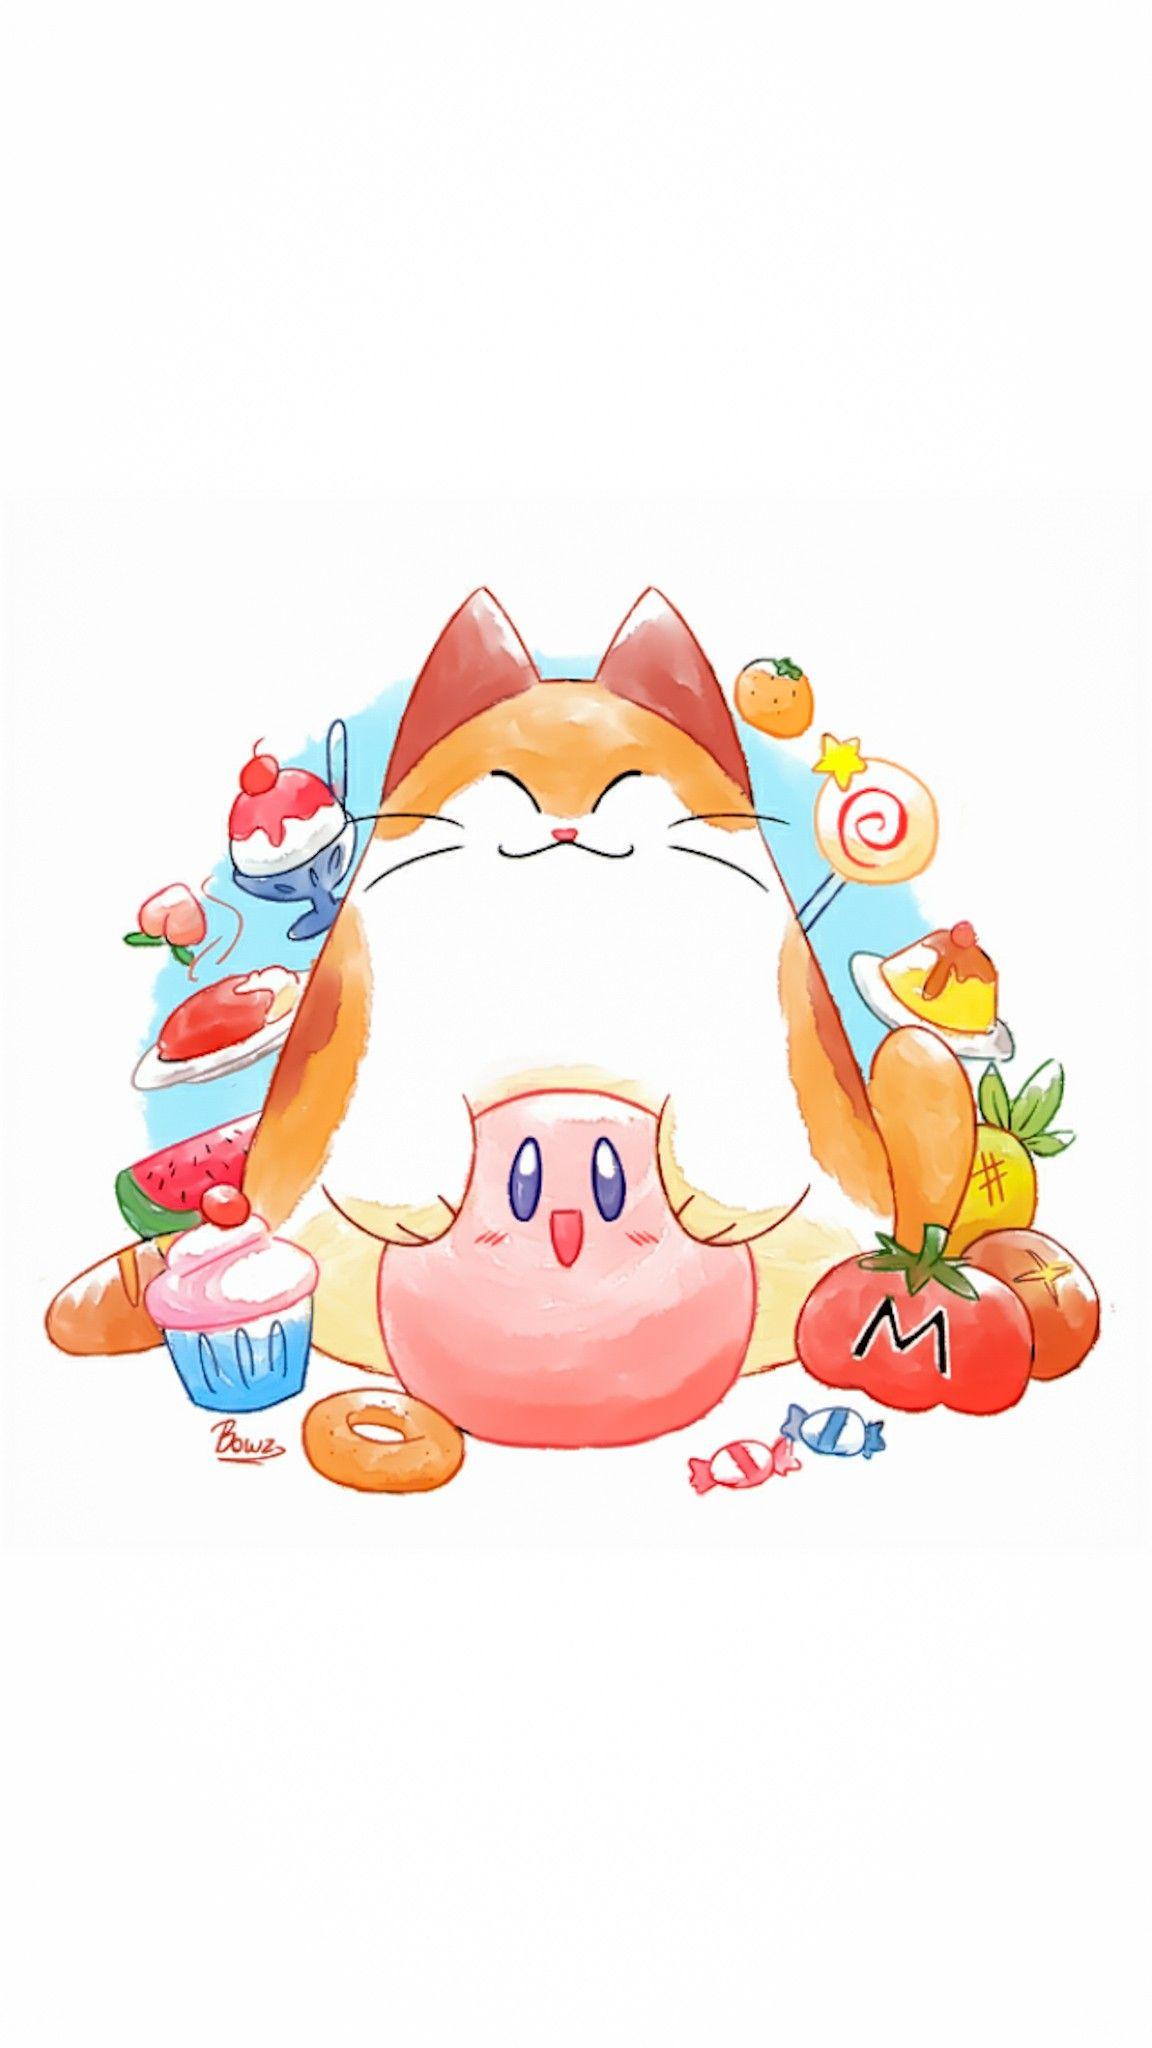 Pin by Krstina on Kirby ☆ BGW in 2020 Kirby art, Kirby